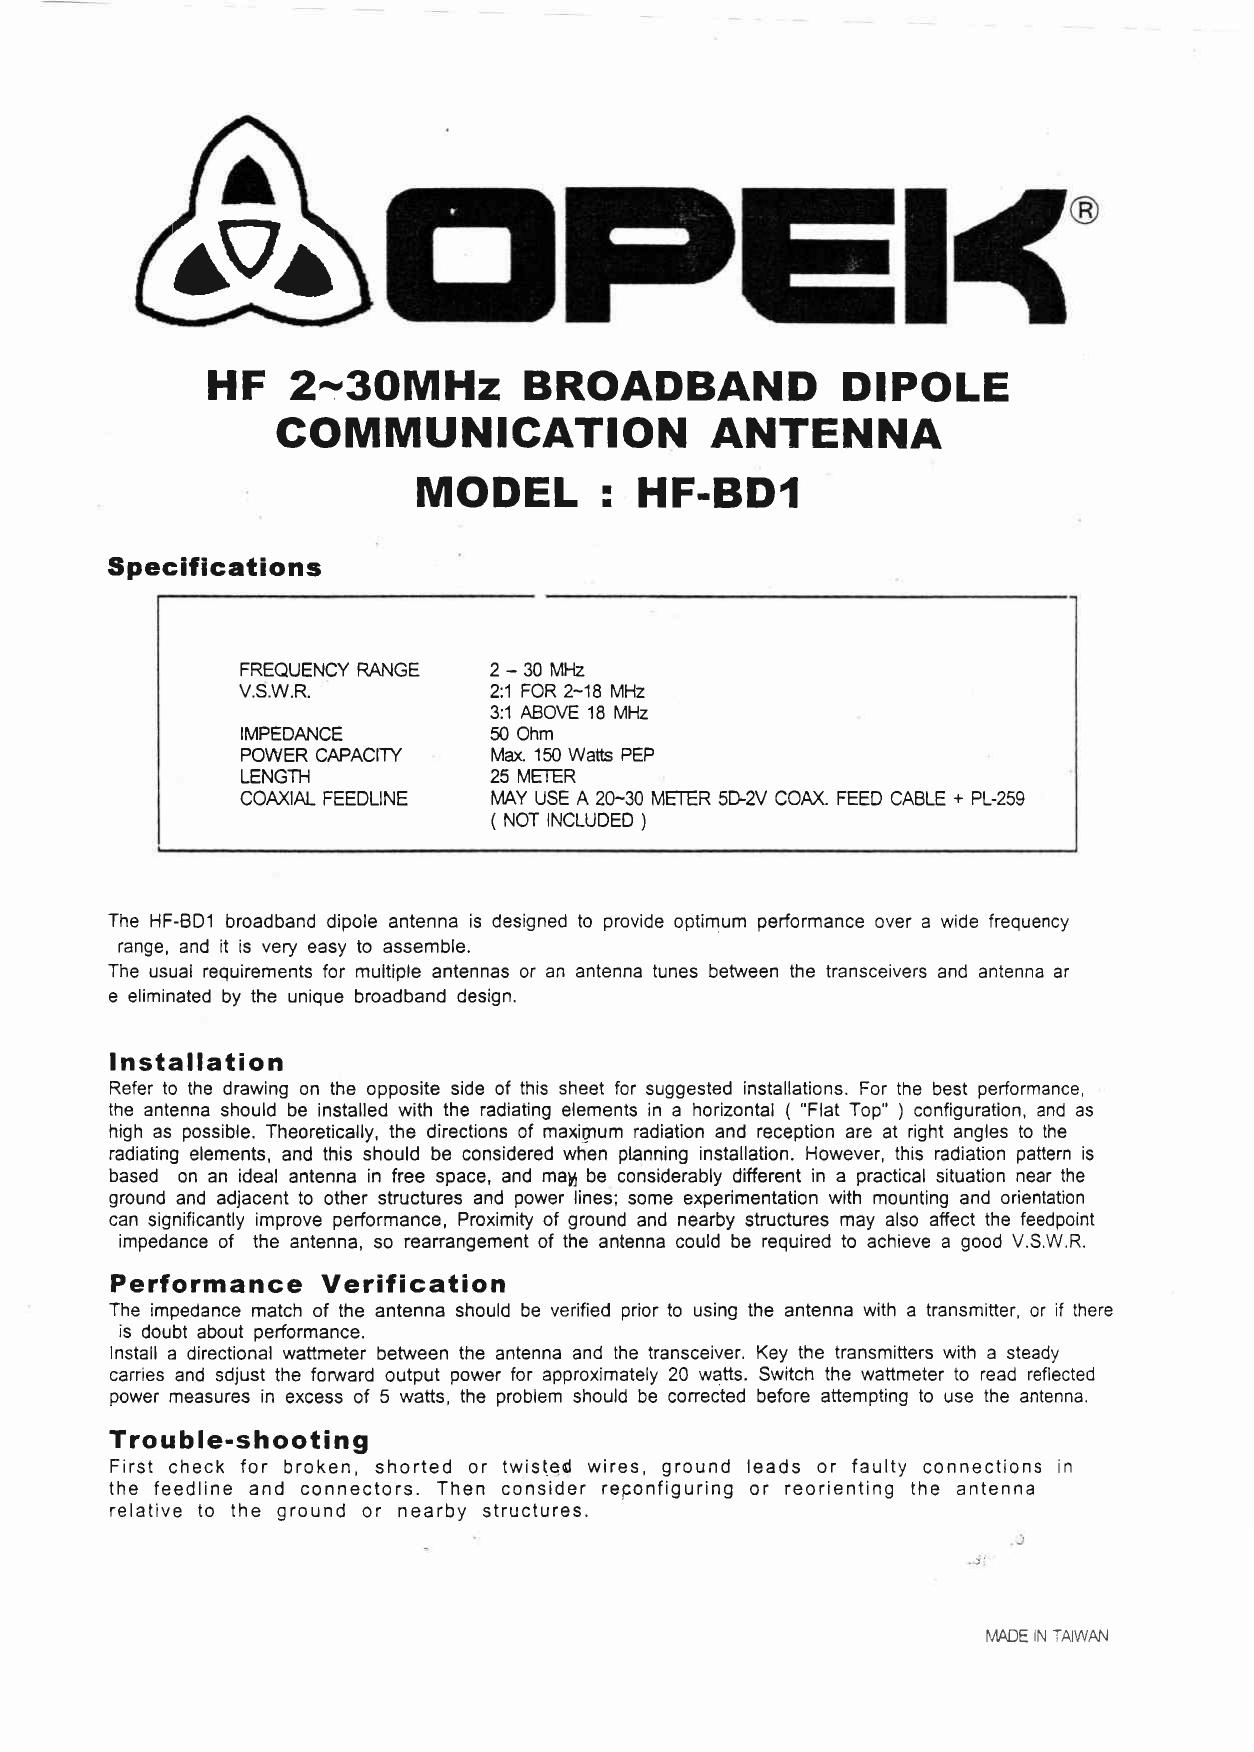 HF 2-3OMHz BROADBAND DIPOLE   manualzz com